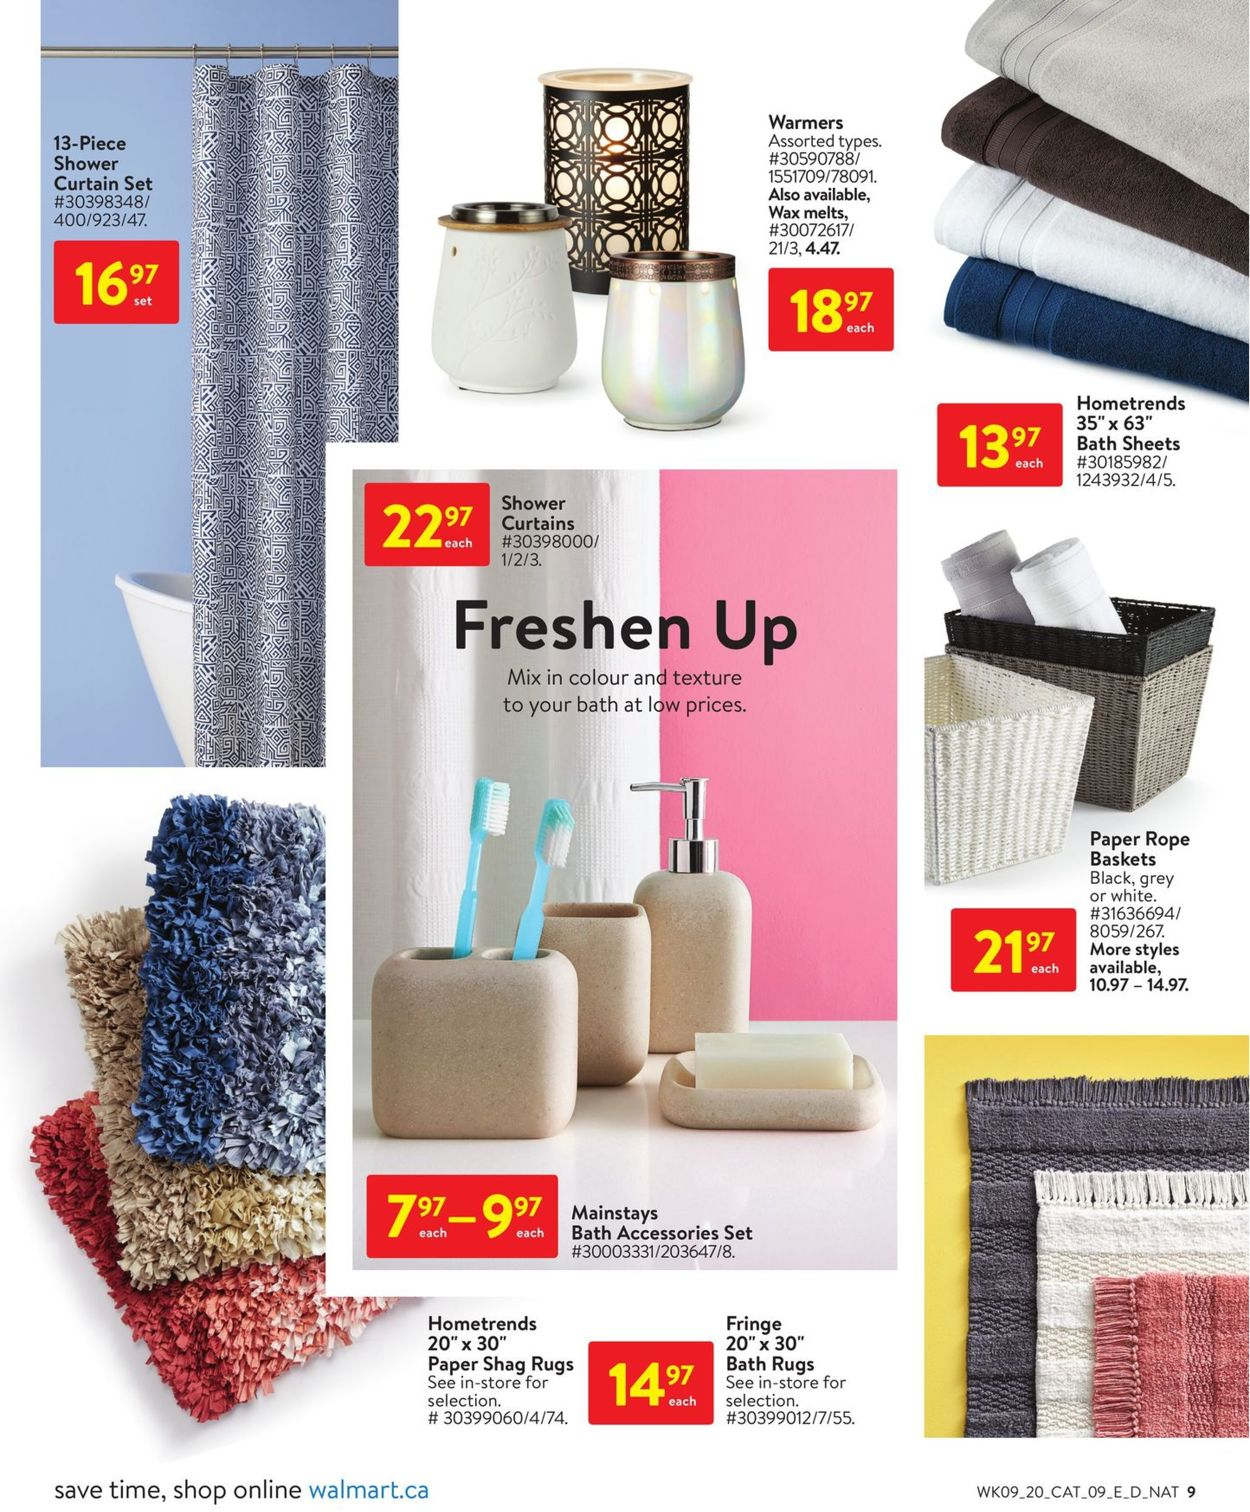 Walmart Flyer - 03/26-04/22/2020 (Page 9)